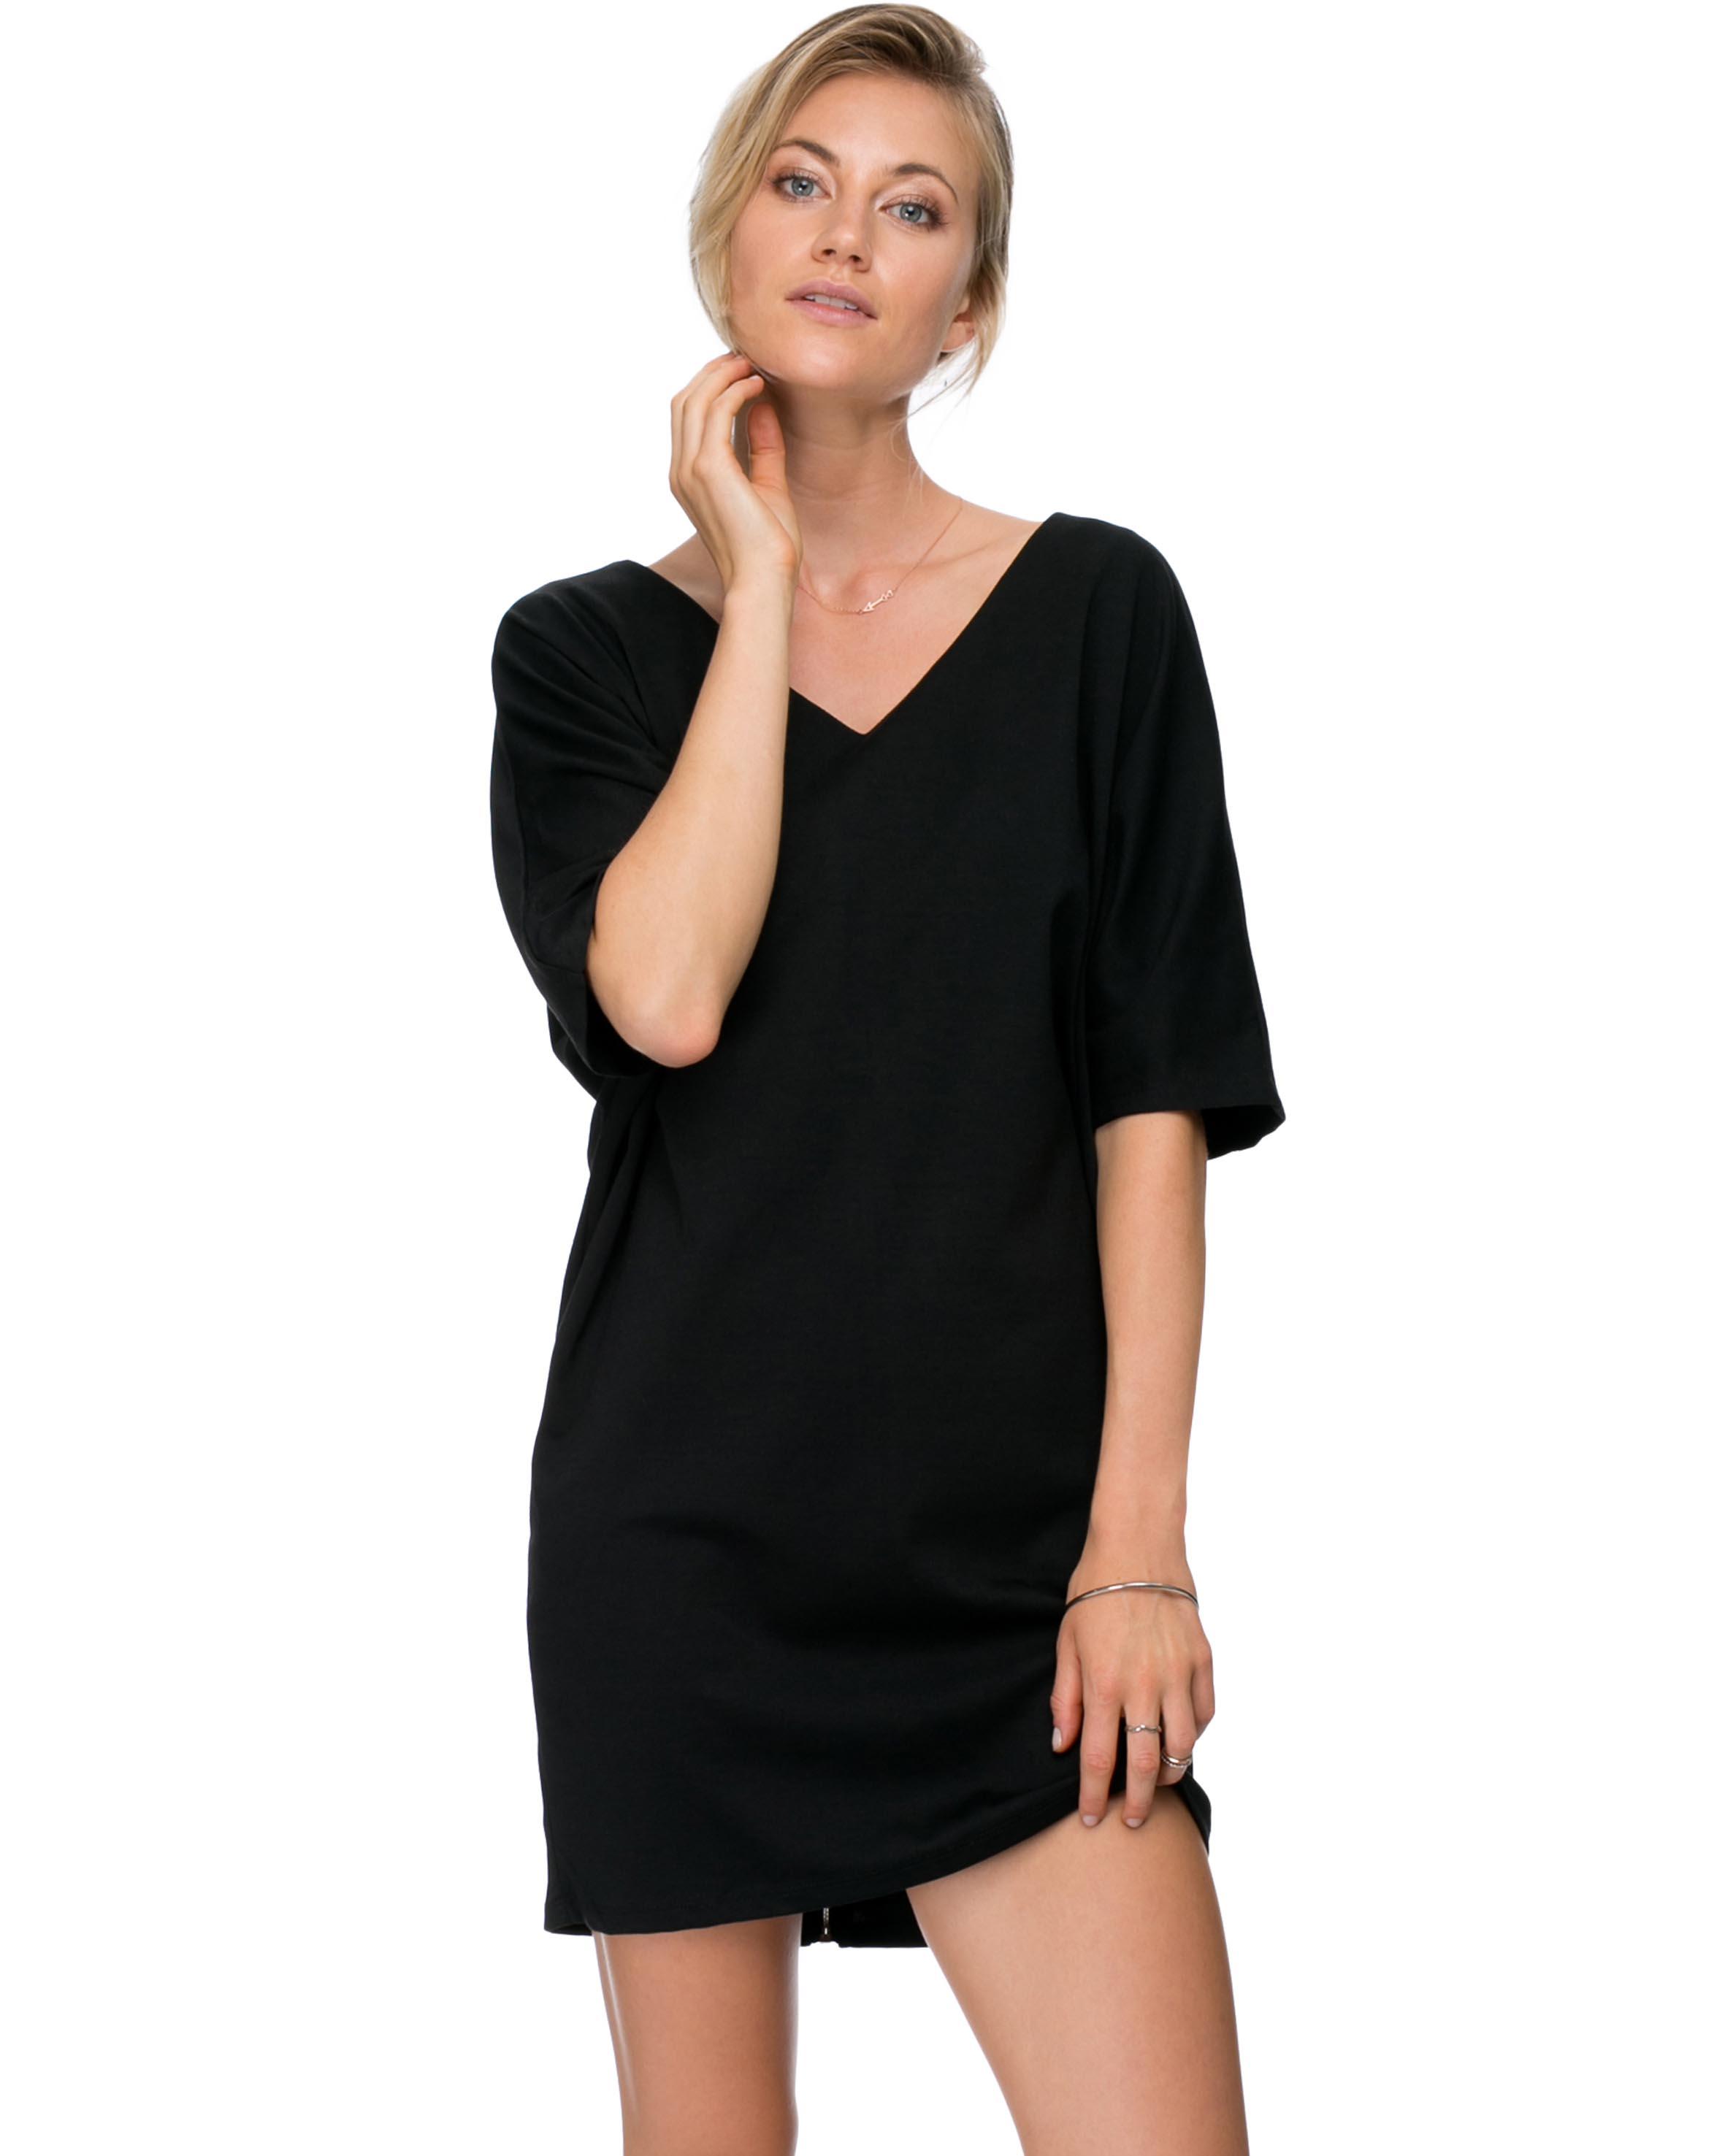 Online clothing stores Body basics clothing store